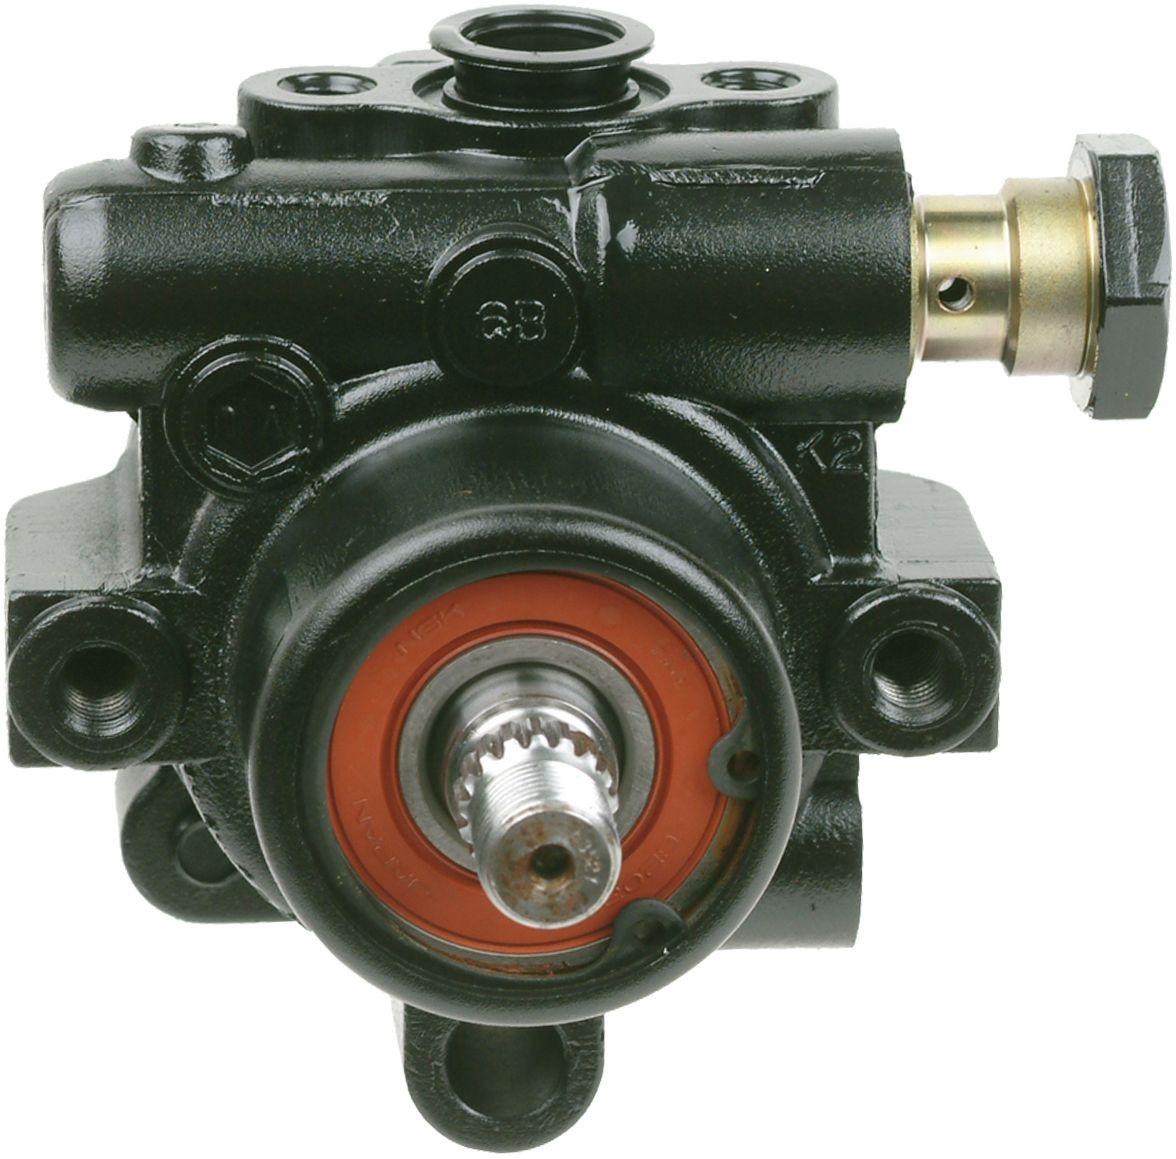 hight resolution of 2006 nissan murano power steering pump a1 21 5367